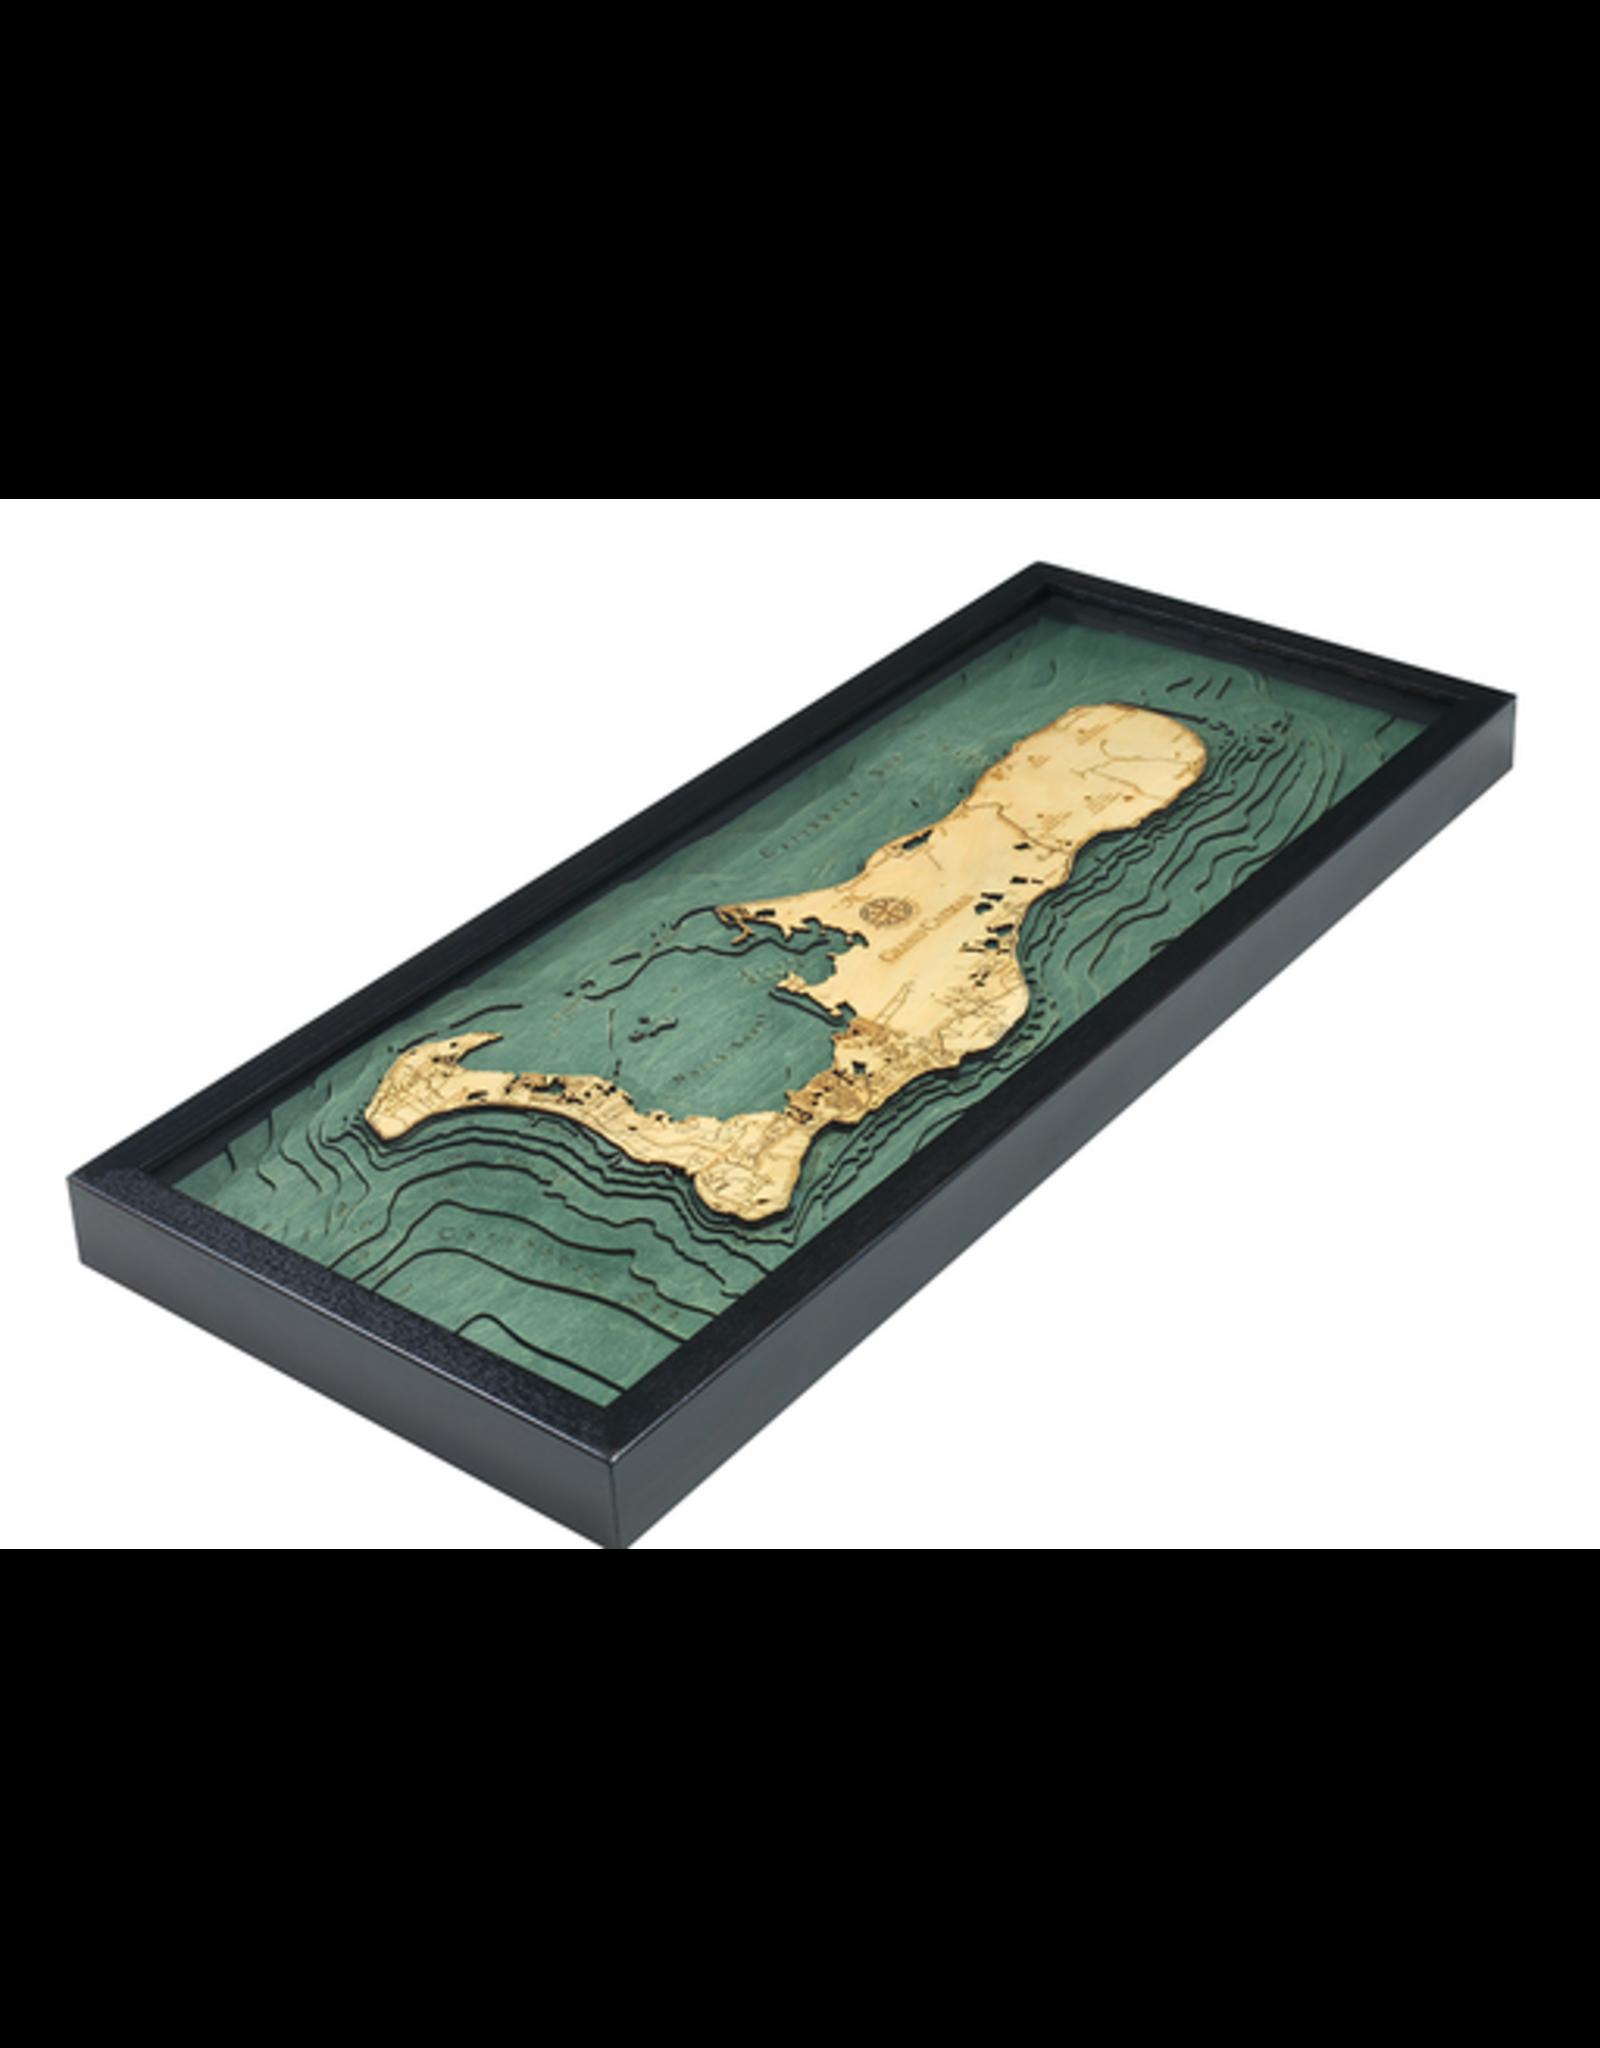 WoodCharts Cayman Island (Bathymetric 3-D Wood Carved Nautical Chart)